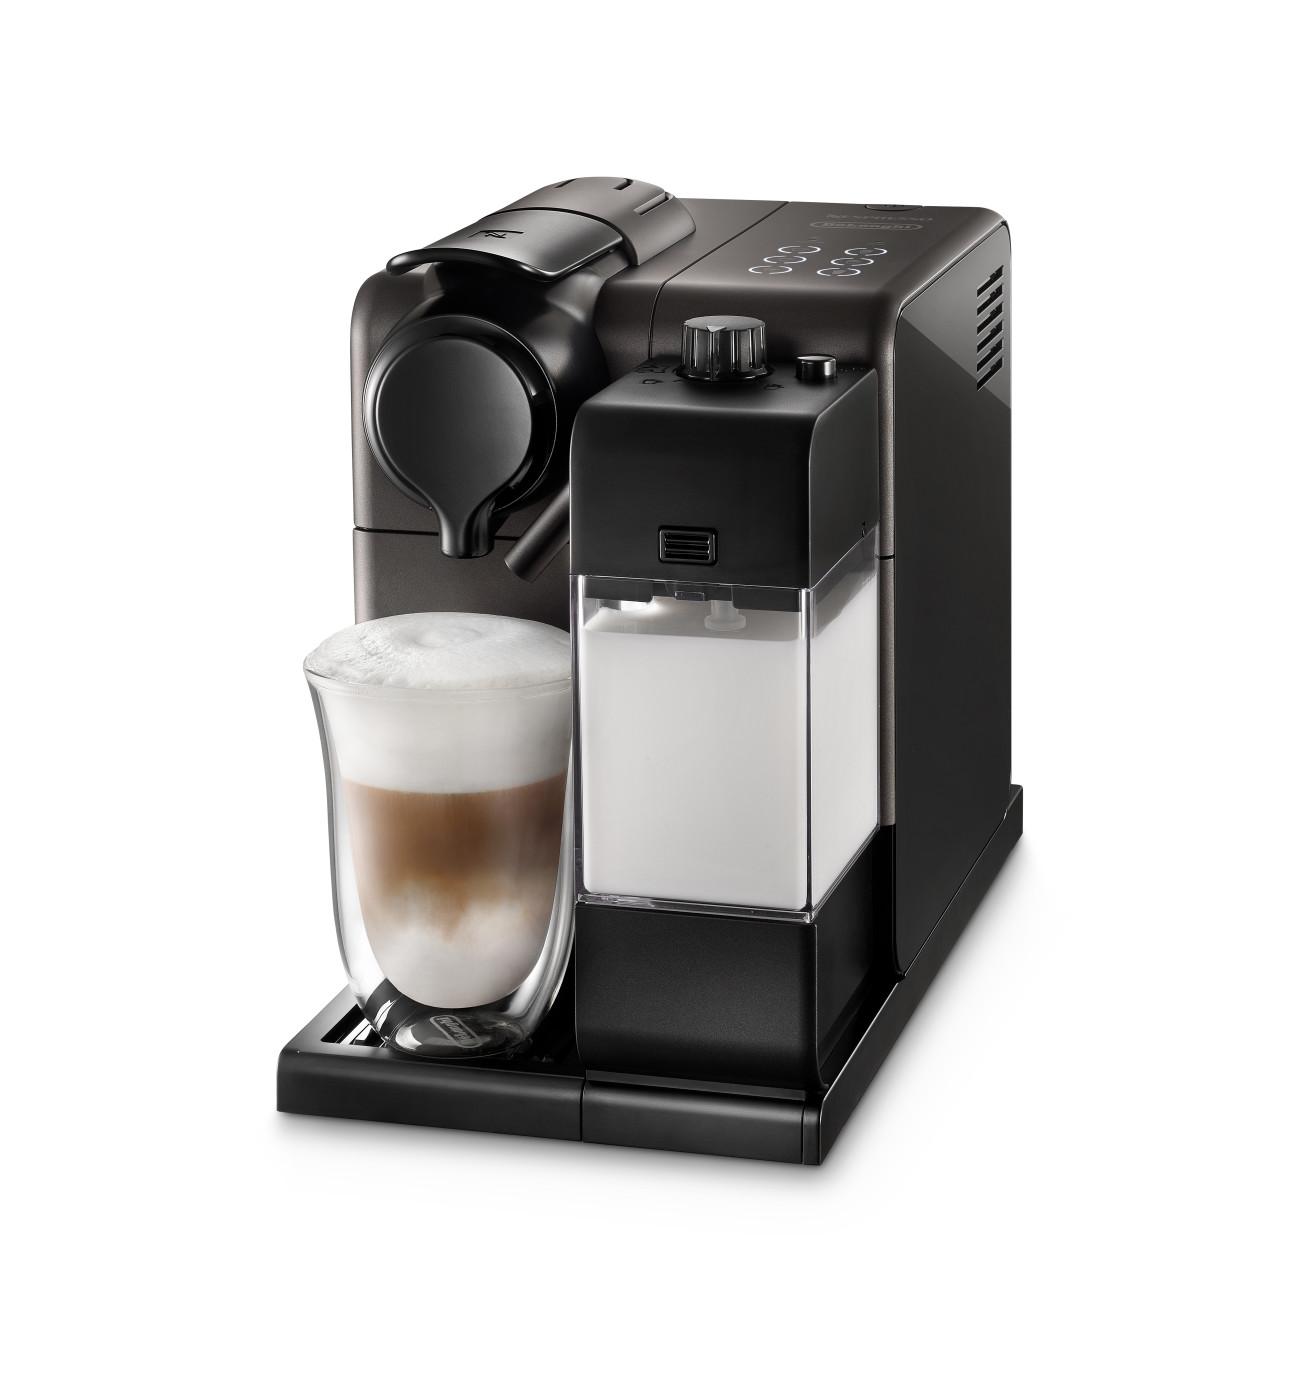 Electronic David Jones Coffee Machines nespresso coffee machines david jones en550bm lattissima touch in black titanium